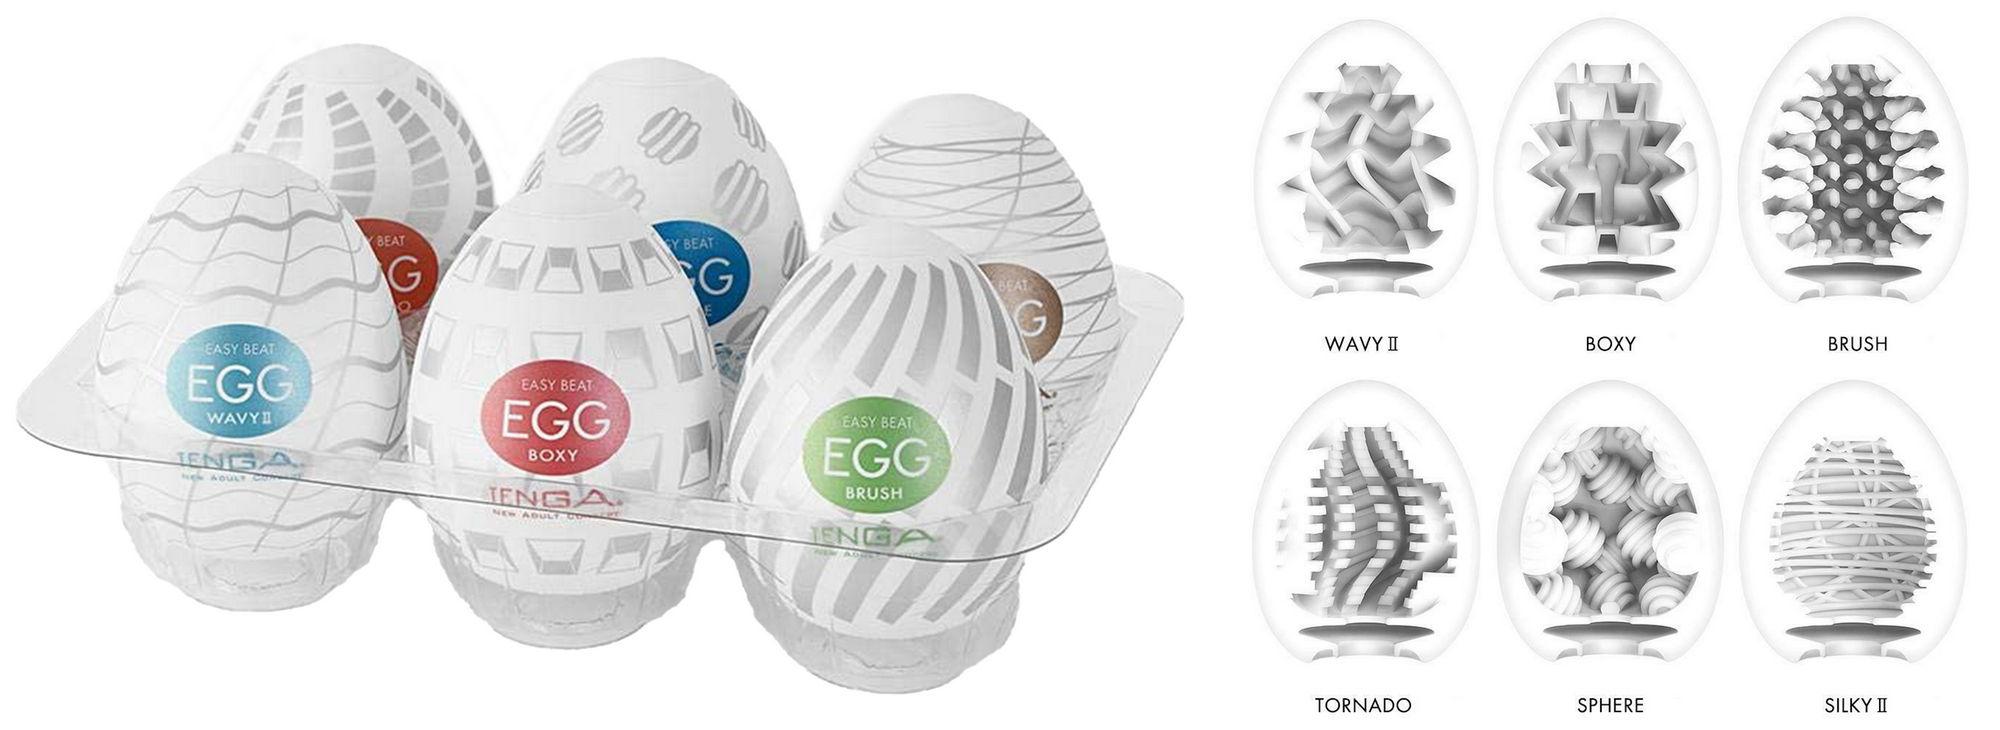 Tenga Egg Pack 3